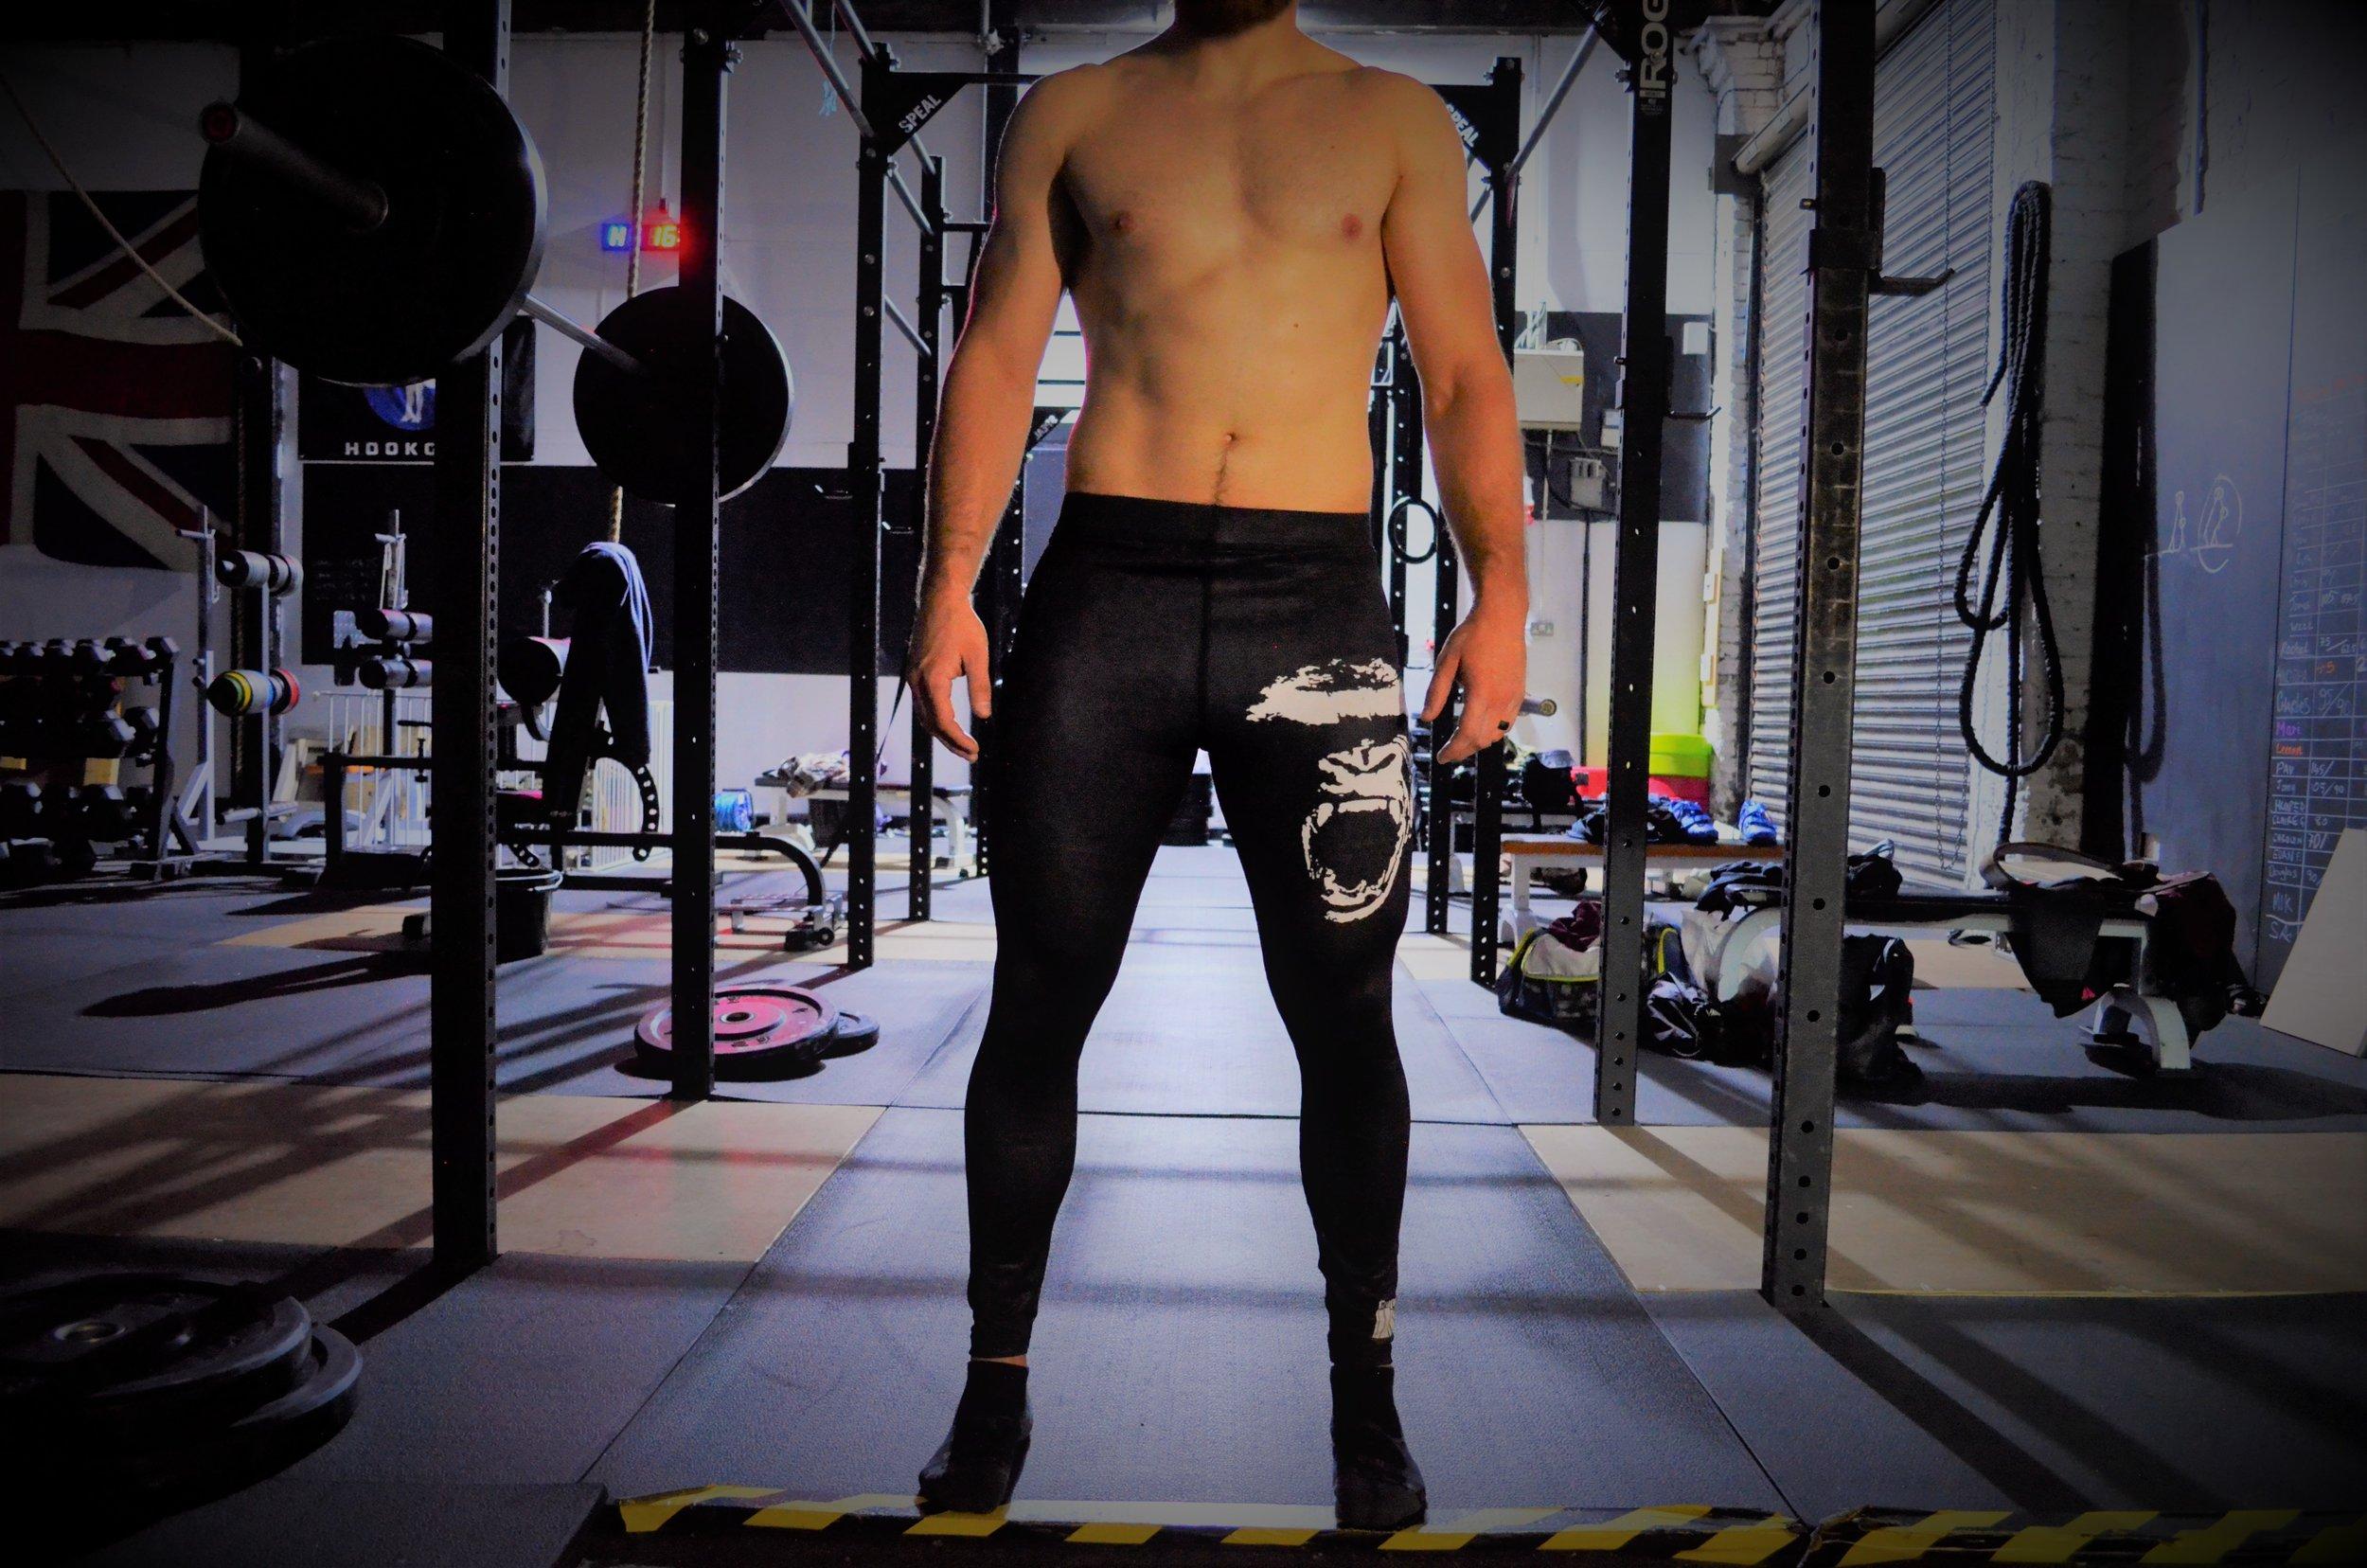 Custom bespoke spats